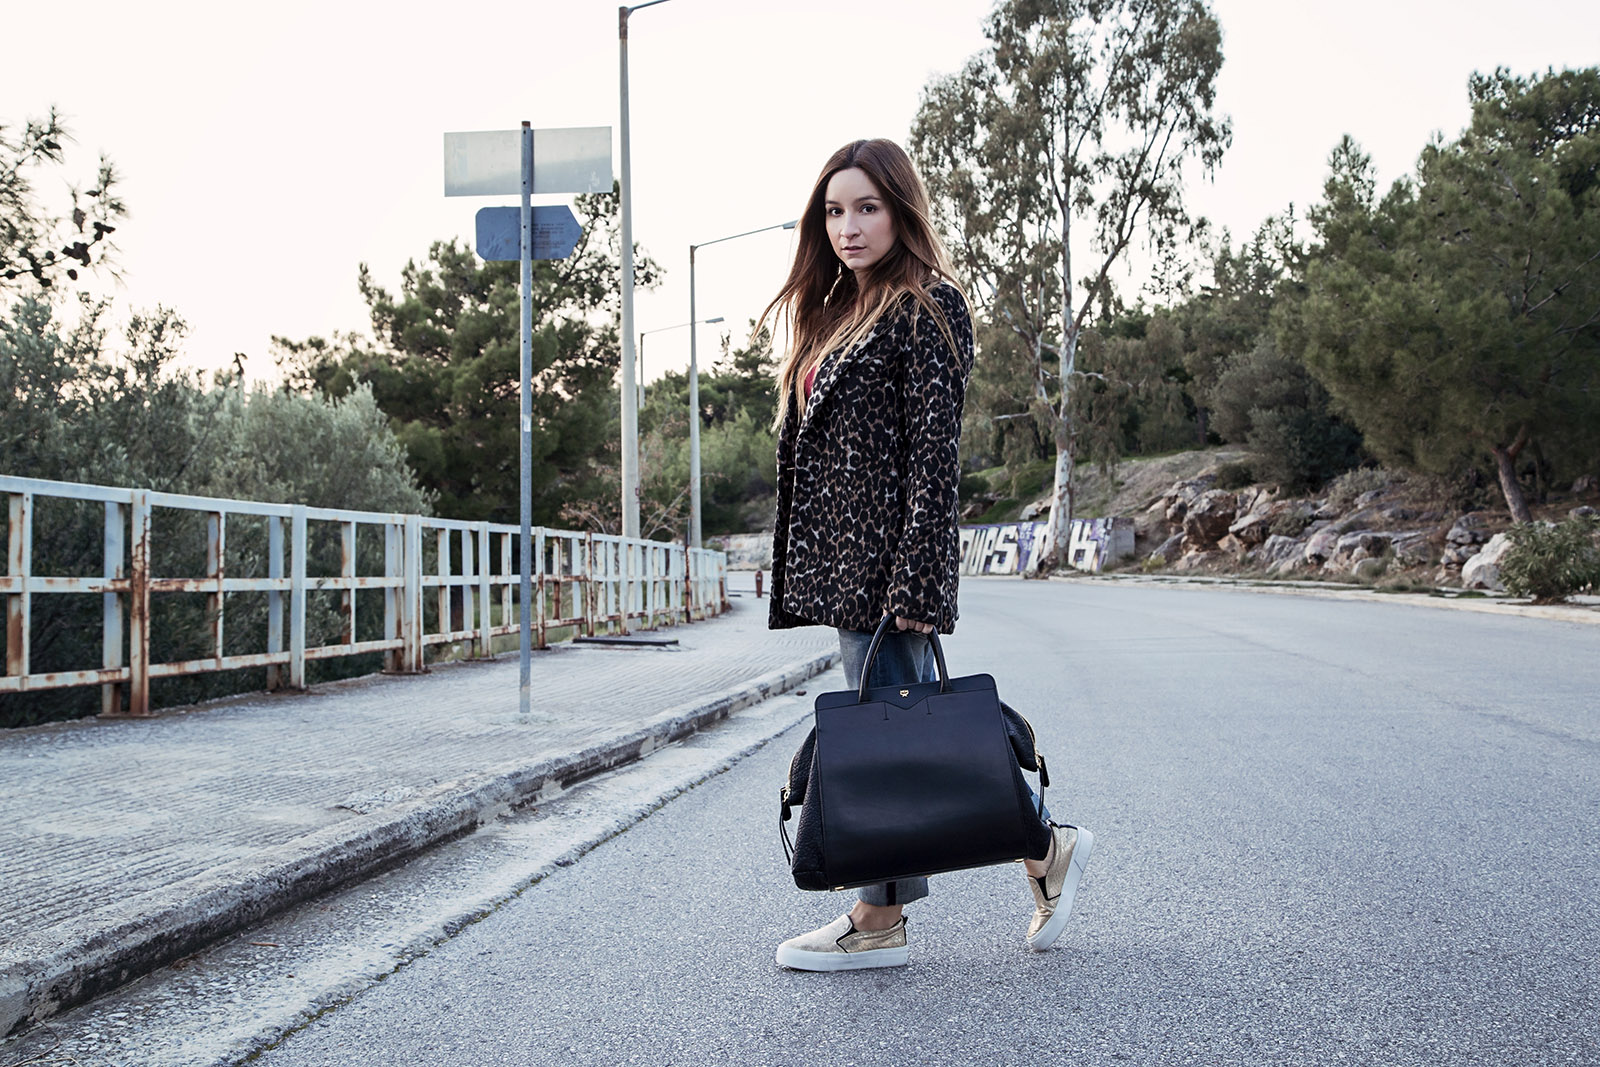 af225619358 Jeans: Replay | Bag: MCM | Shoes: Bershka | Blouse: Mango | Coat: Forever 21